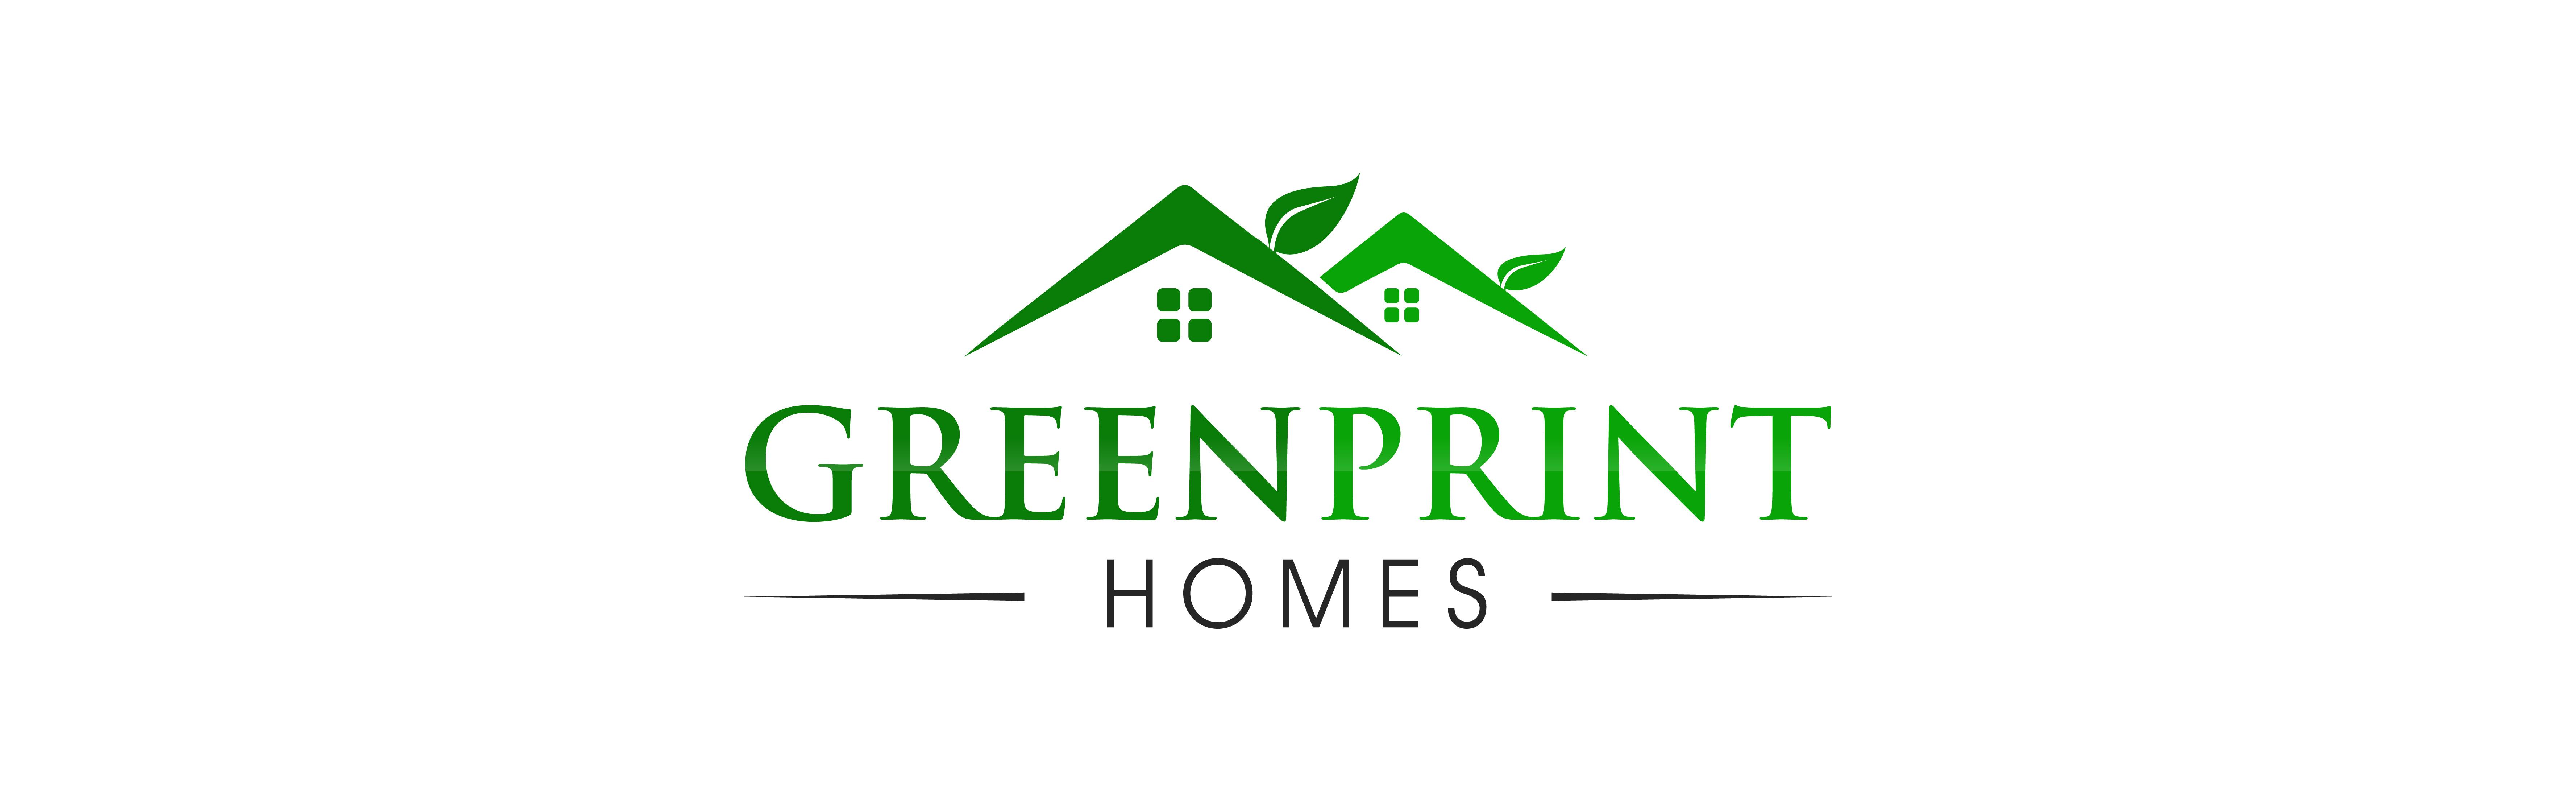 Green Print Homes